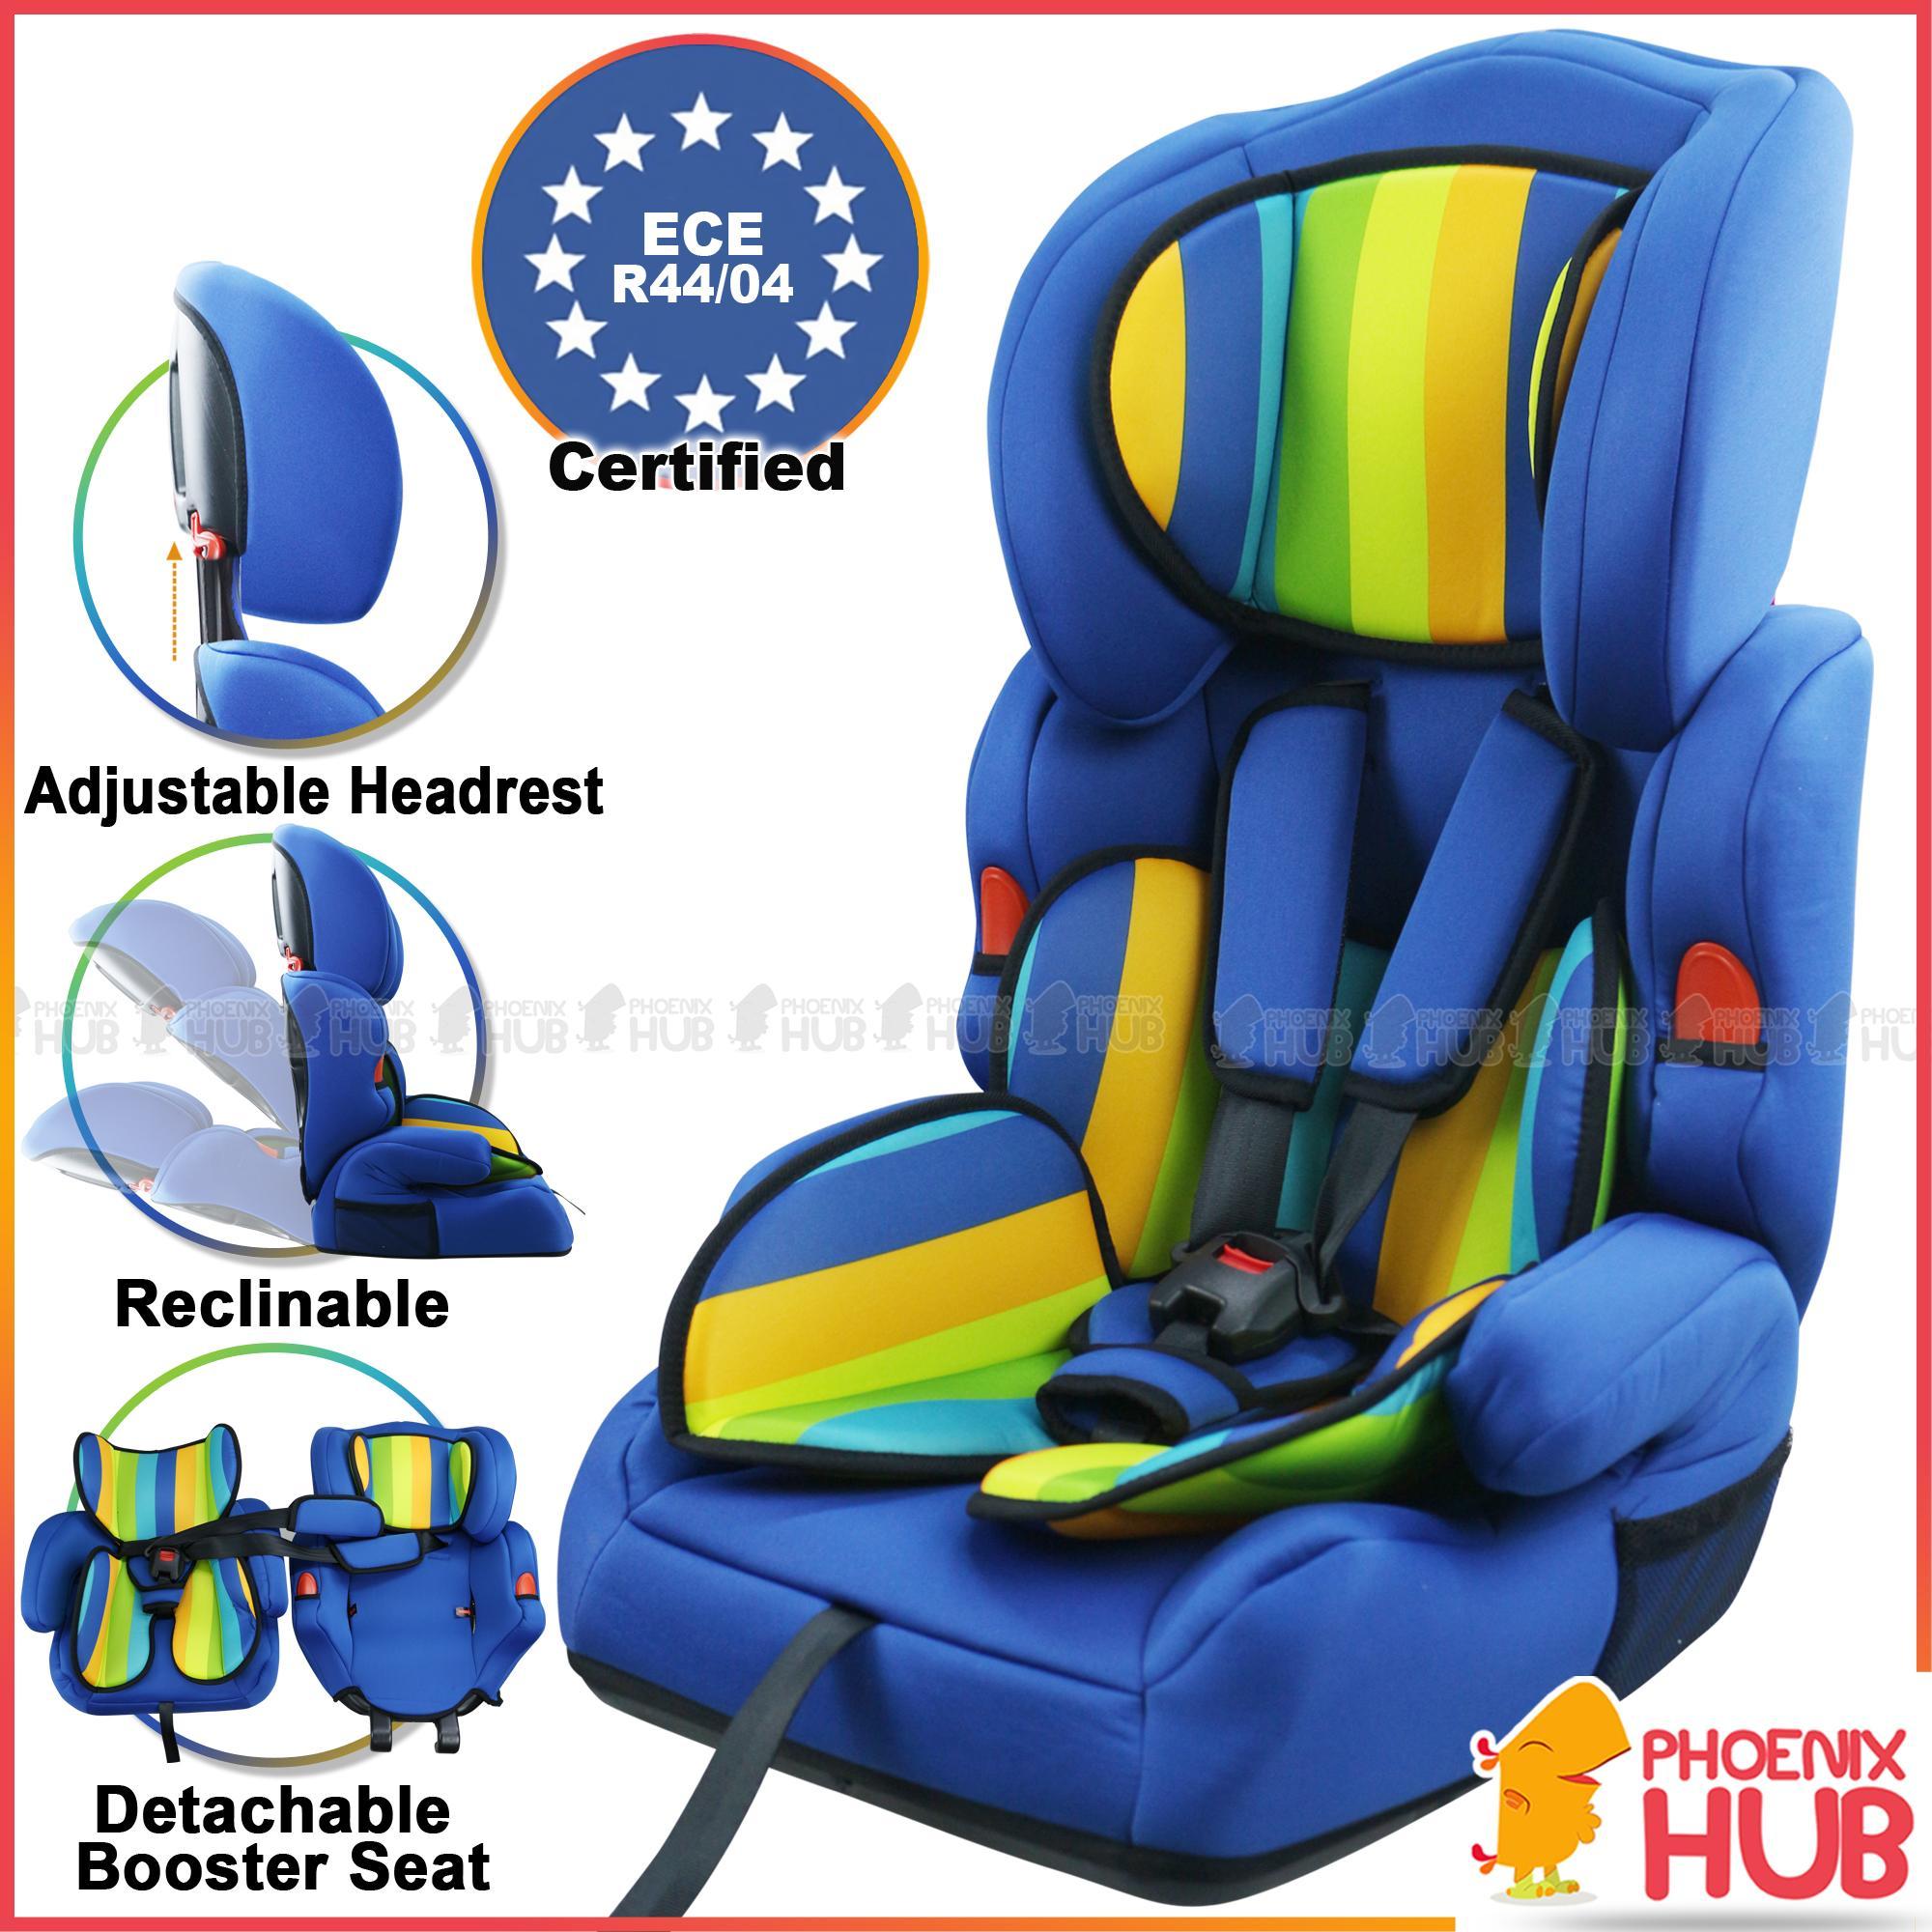 db7a90b5d6a2 Baby Car Seat for sale - Car Seat for Baby Online Deals & Prices in ...